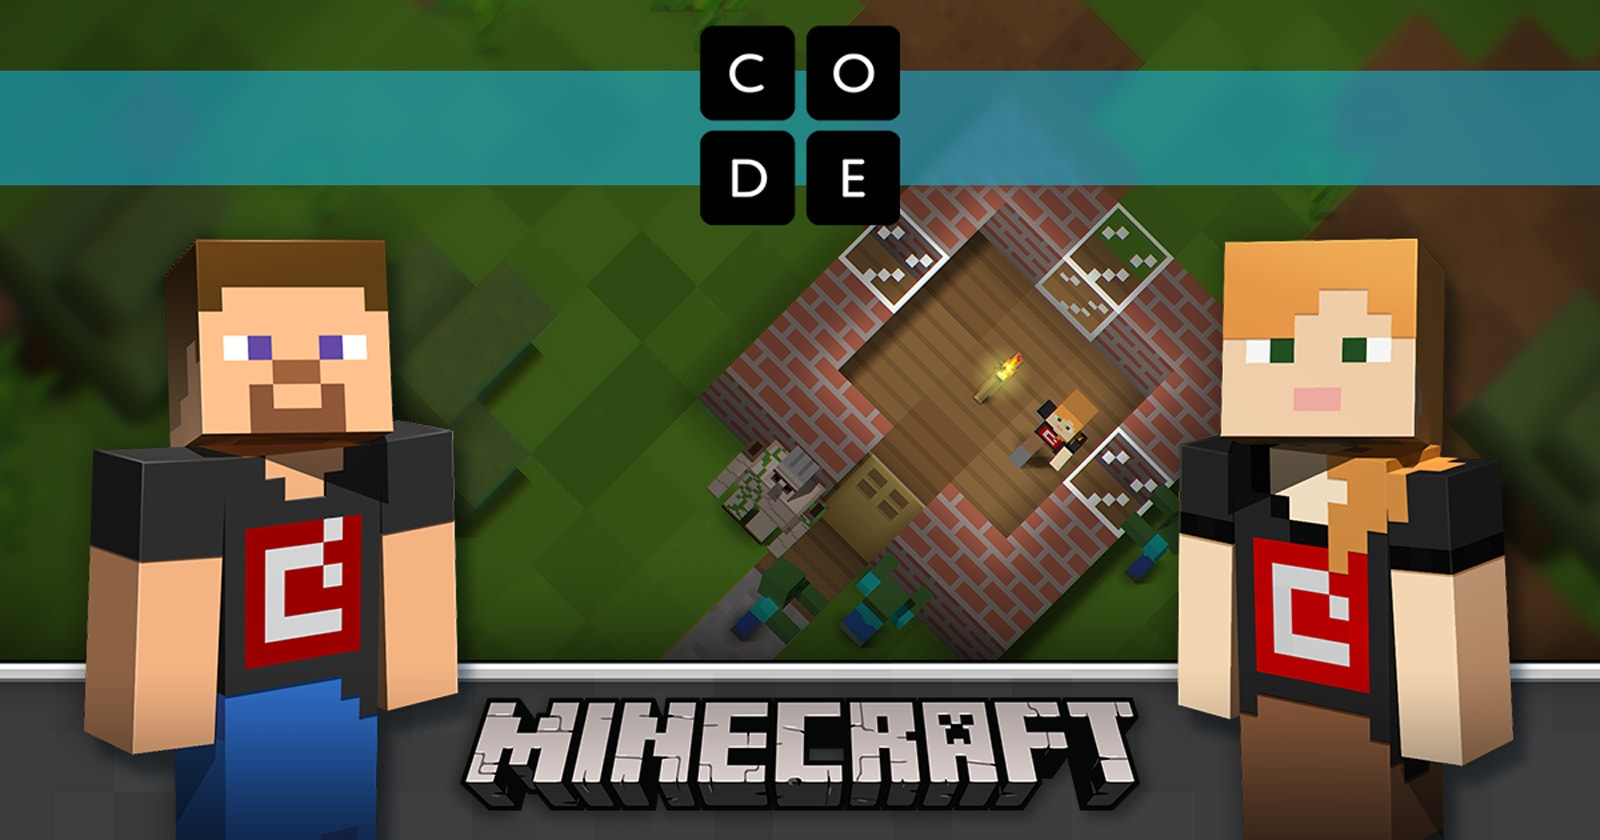 minecraft zombie sounds 1 hour